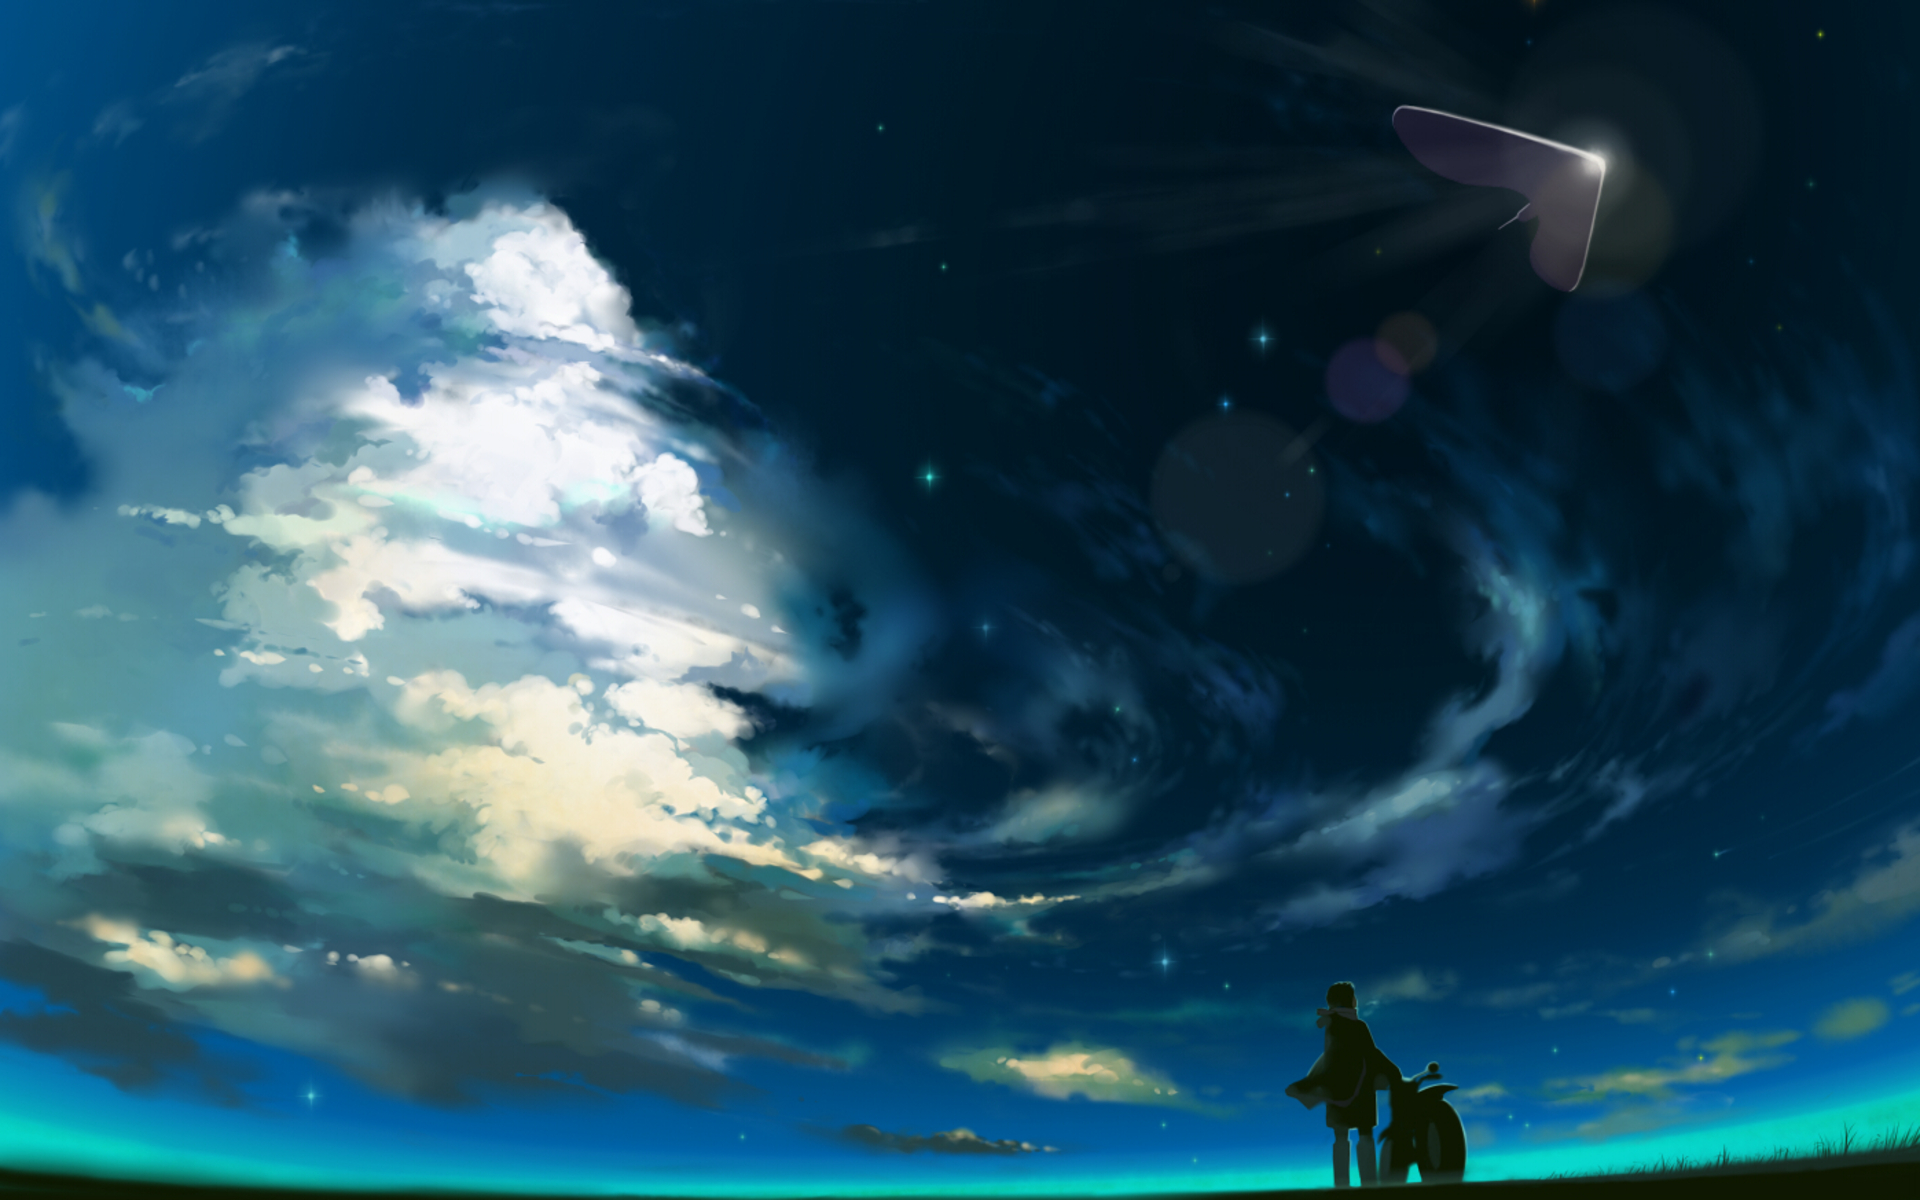 Beautiful HD Anime Wallpaper - WallpaperSafari